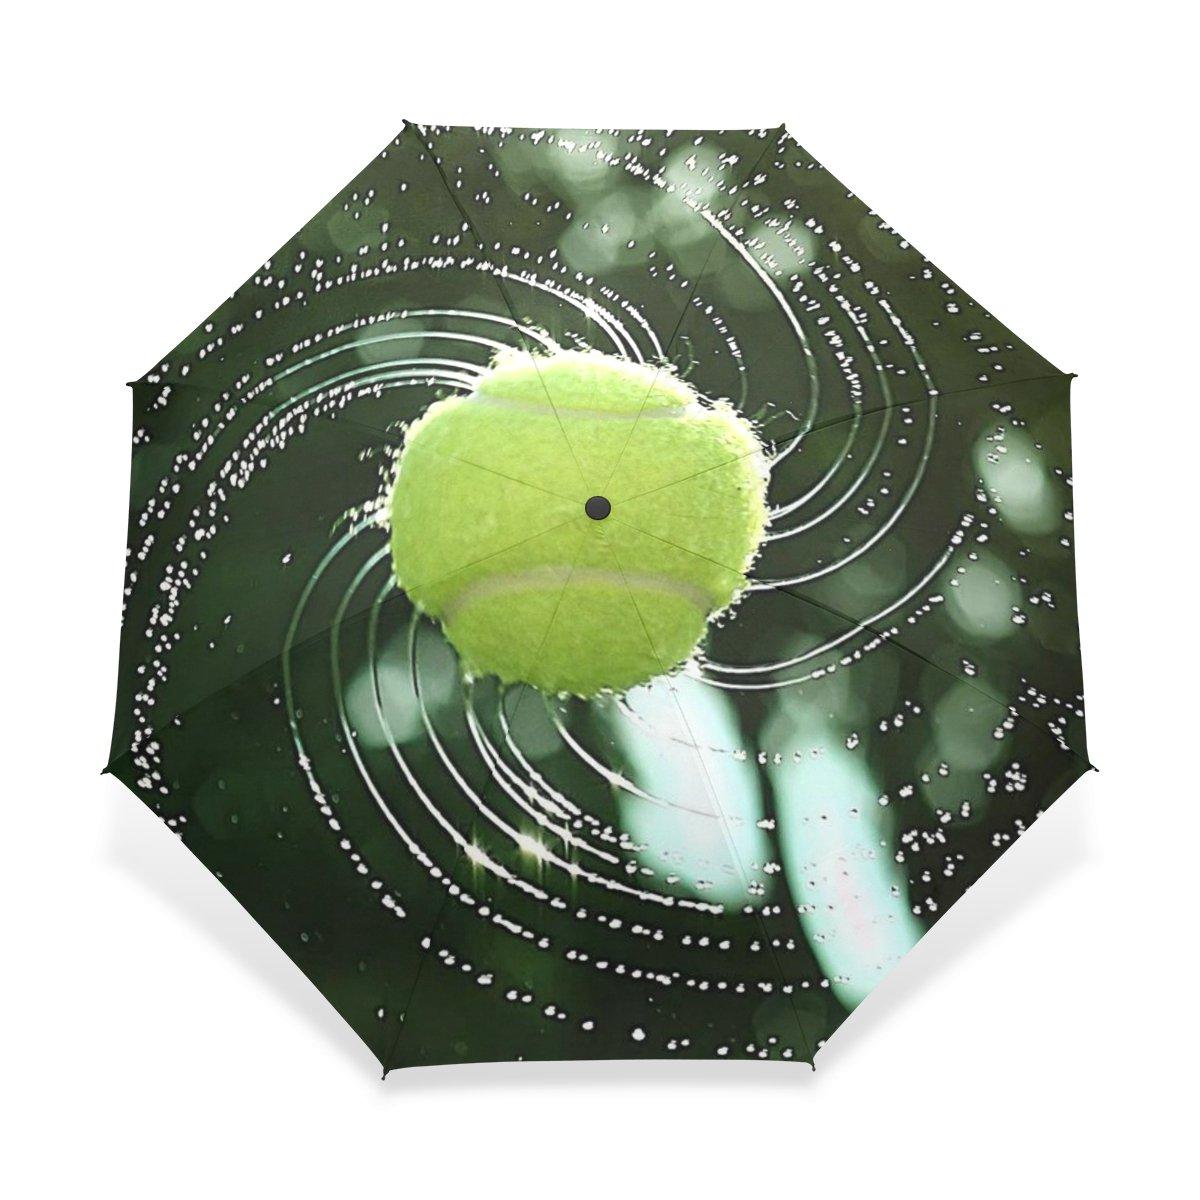 baihuishop防風ゴルフ傘、コンパクトで旅行for Easy Carryingスポーツ雨傘 – 強力なフレーム壊れないテニスパターン   B01FXH9UK0